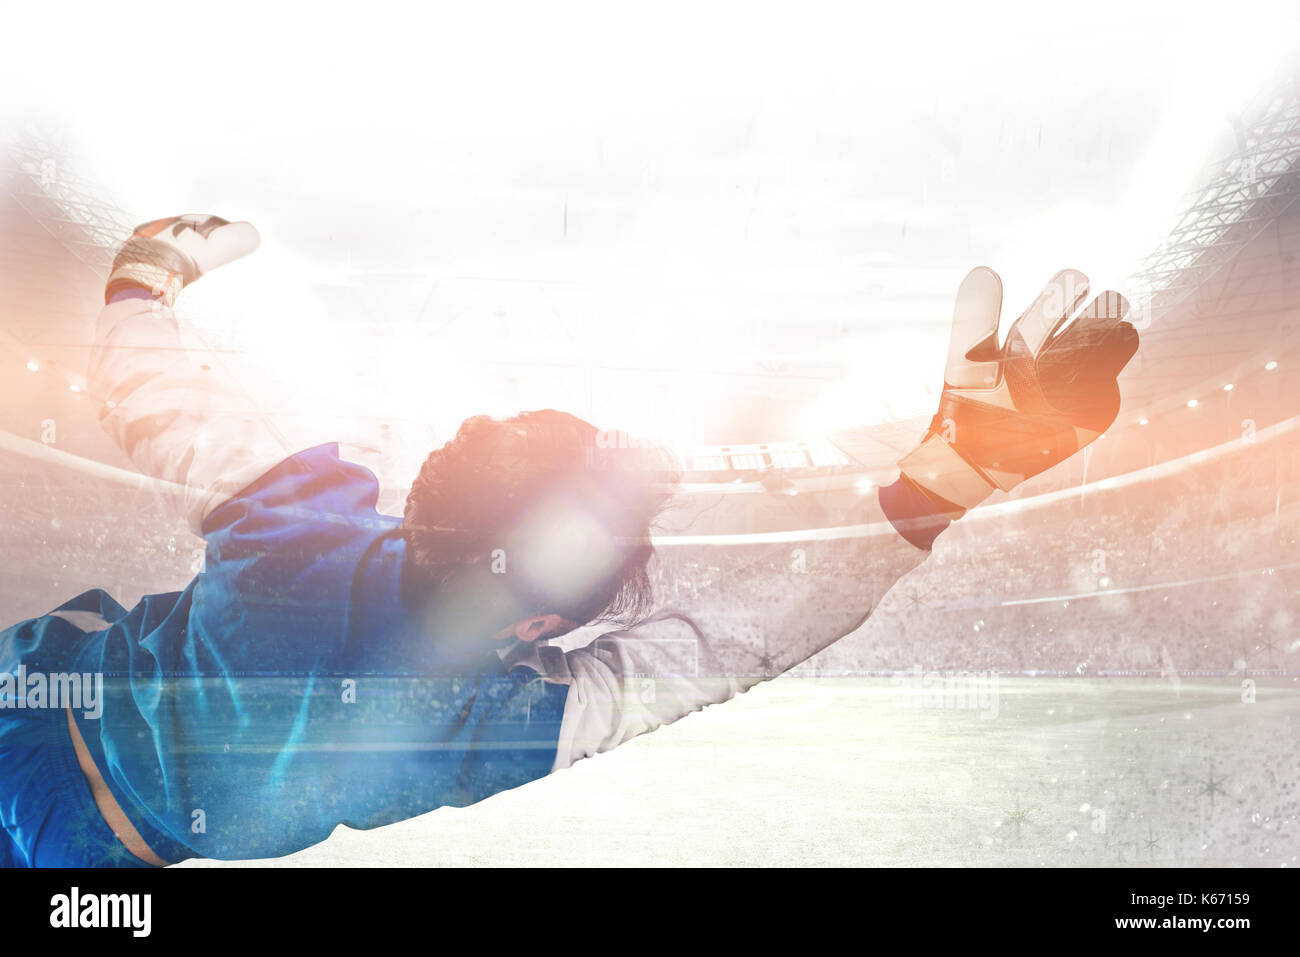 Diving goalkeeper n the stadium - Stock Image